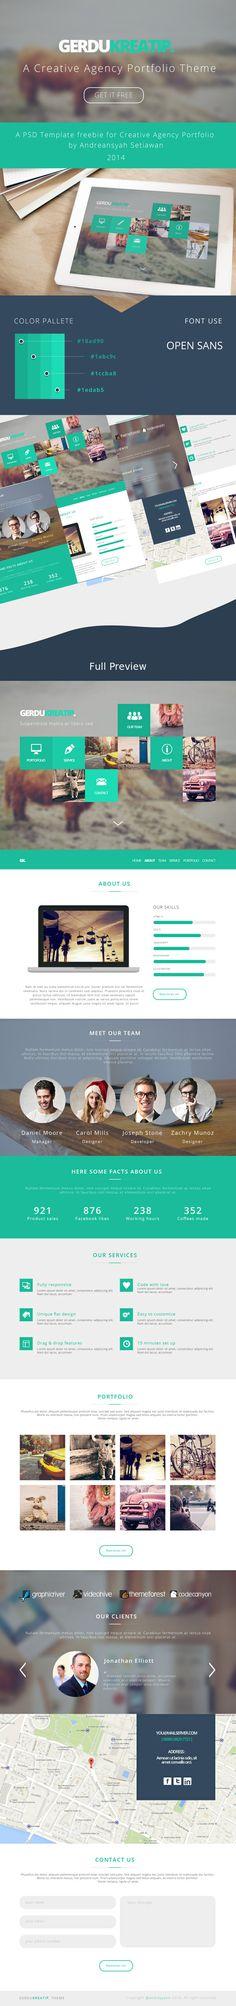 GerduKreatip: Agency Portfolio Theme | GraphicBurger